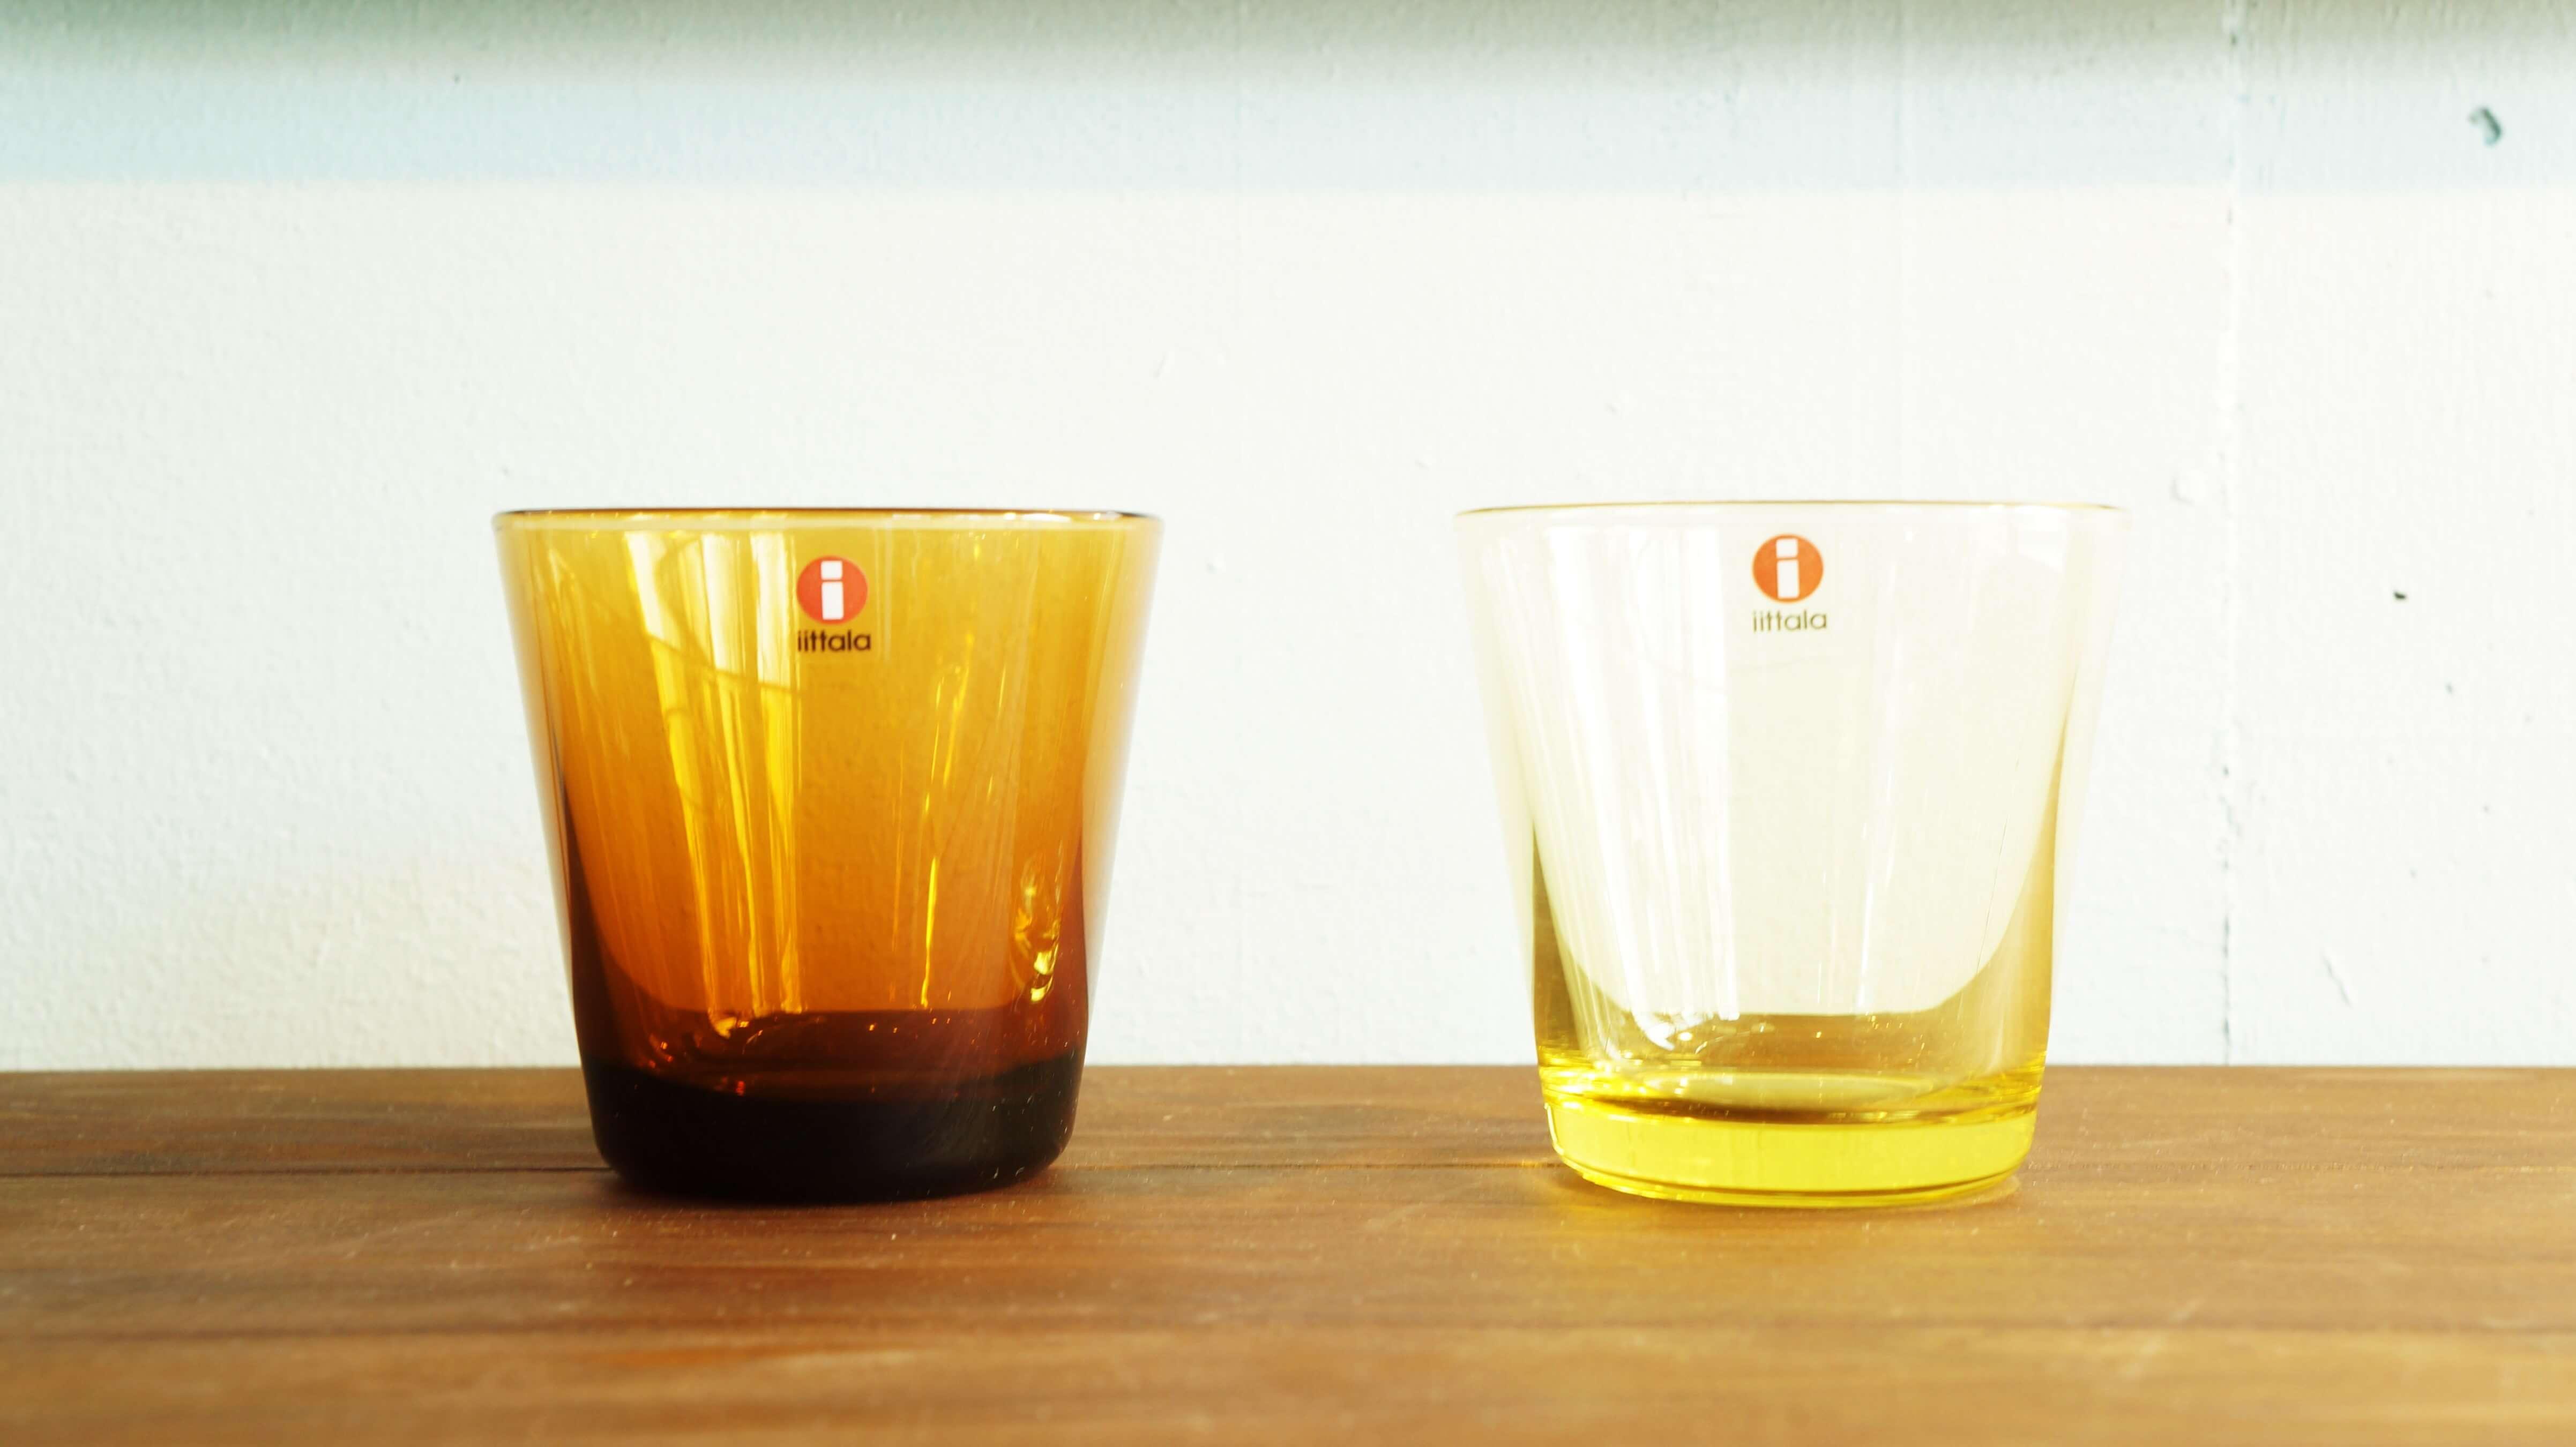 "iittala ""Kartio"" Tumbler designed by Kaj Franck lemon yellow & copper/イッタラ ""カルティオ"" タンブラー カイ・フランク デザイン レモンイエロー&コッパー"